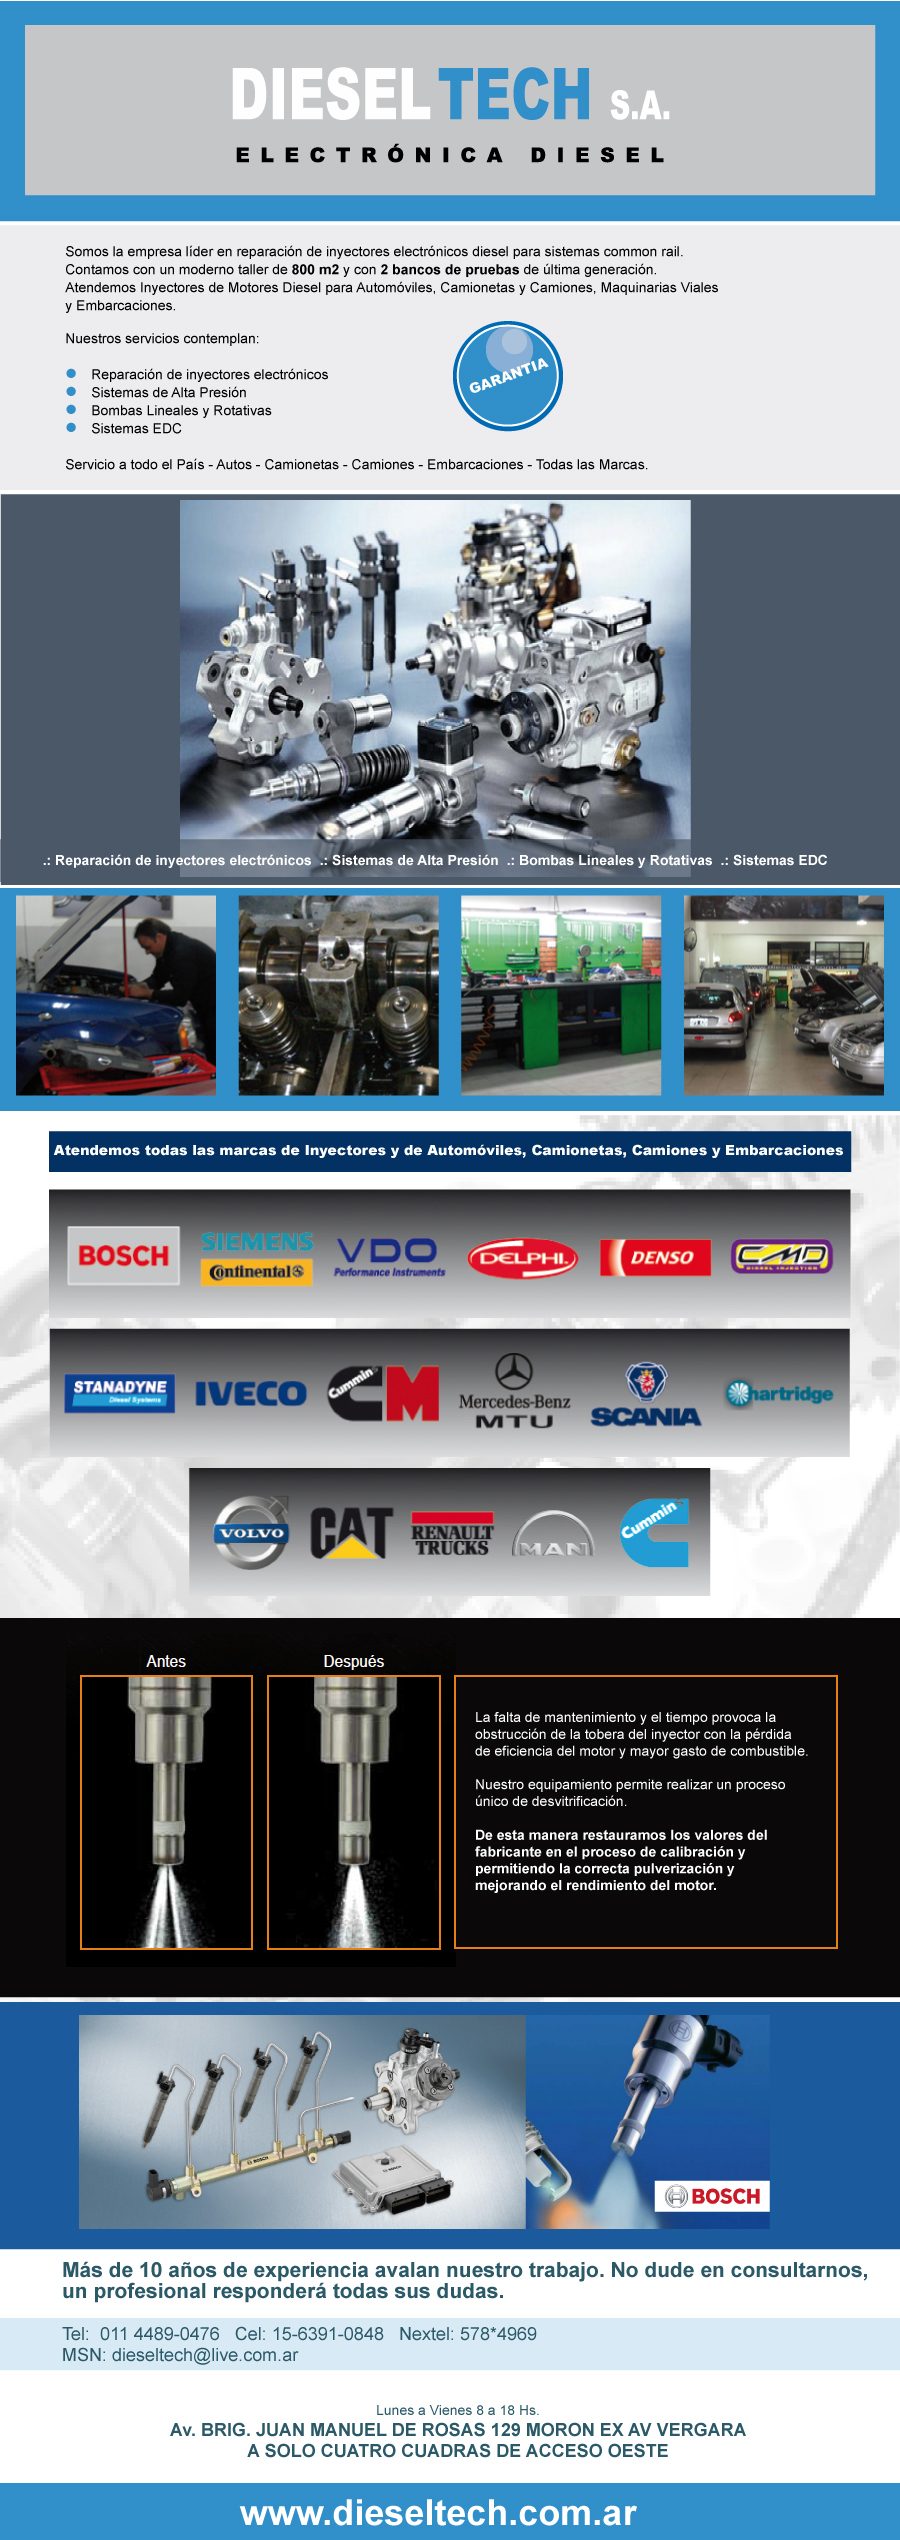 Presentación Dieseltech